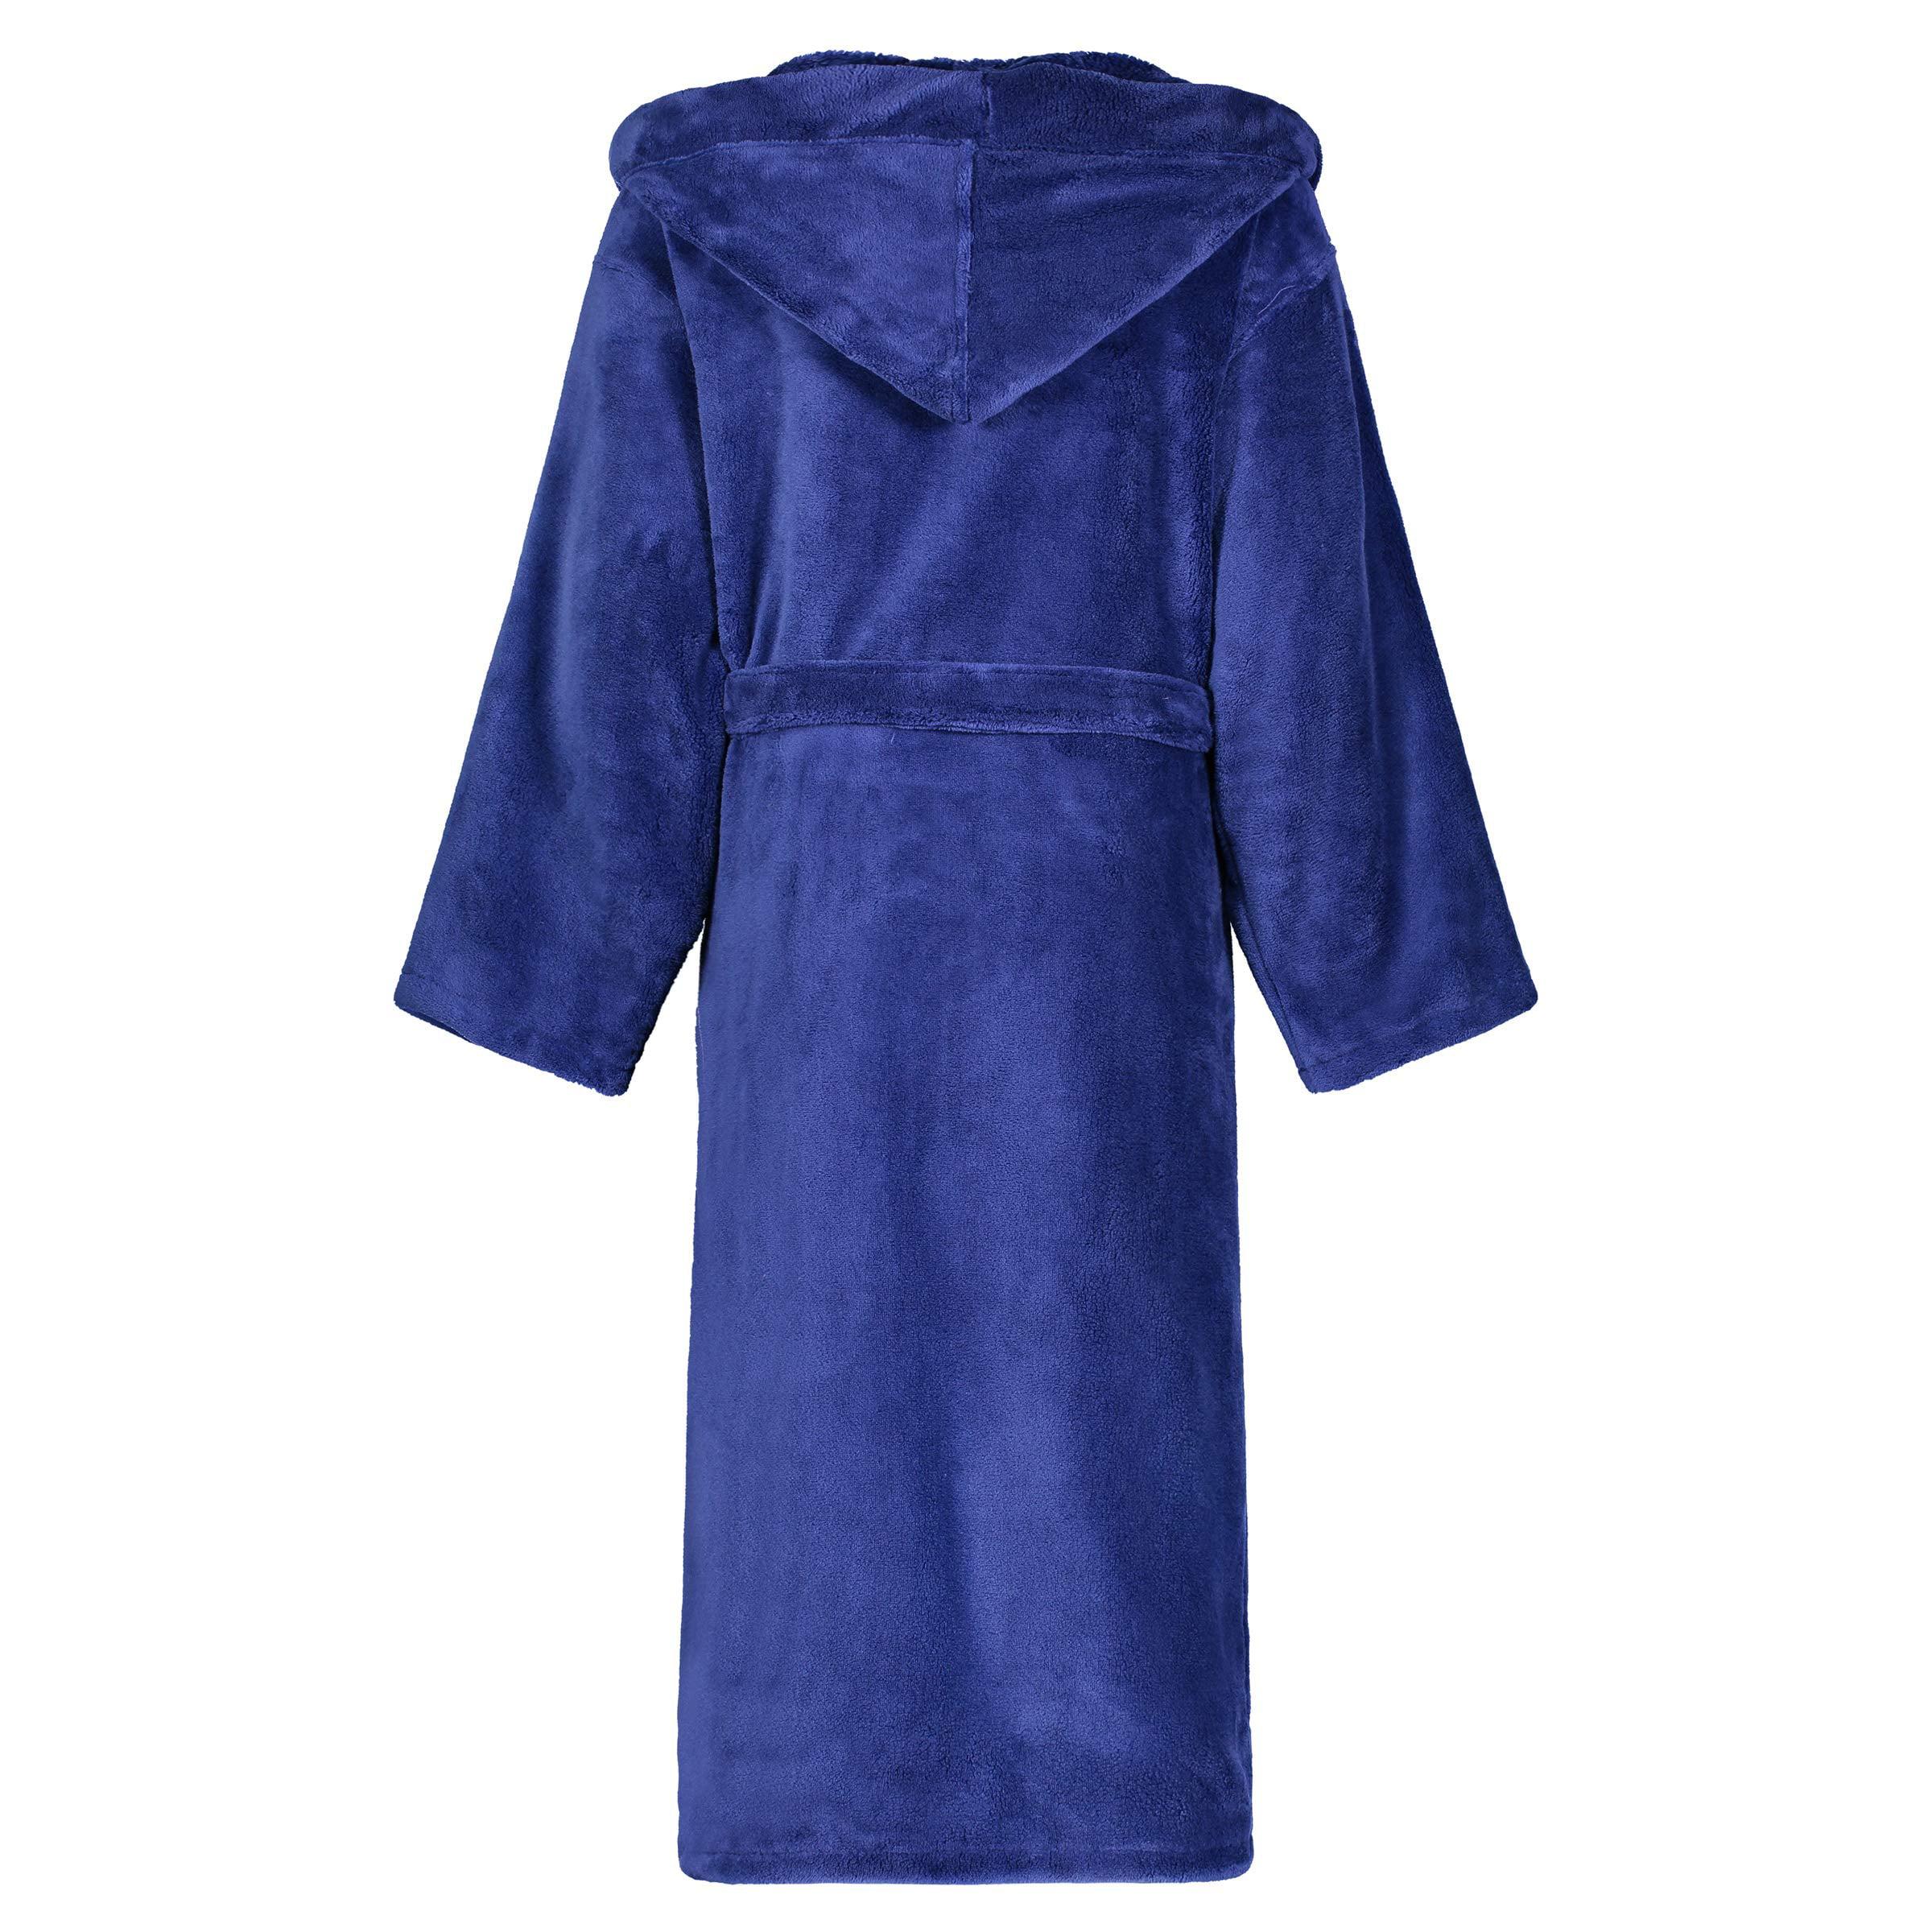 Star Art In Linen Star Kids Robe Soft Plush Hooded Fleece Robe Sleep Robe Bathrobe Boys Girls 14 16 Navy Walmart Com Walmart Com